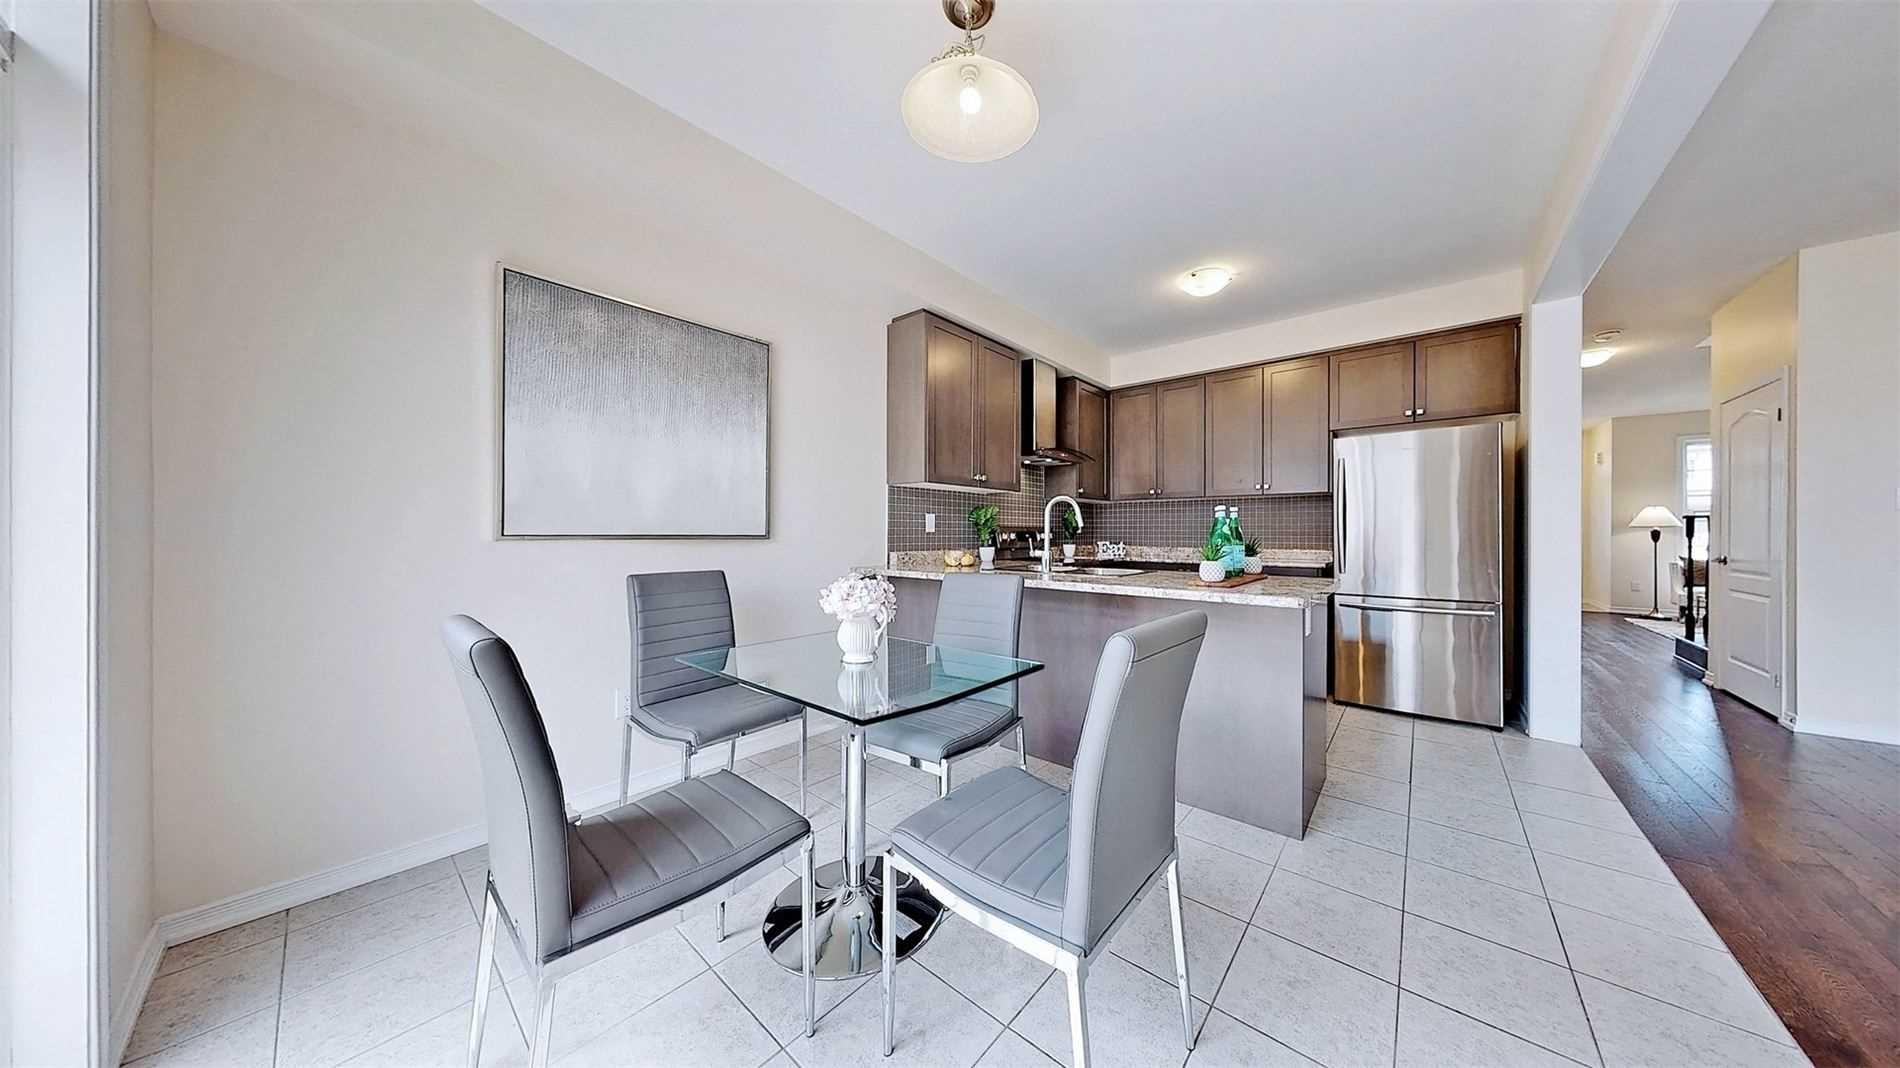 53 Munro Circ, Brantford, Ontario N3T0R5, 4 Bedrooms Bedrooms, 7 Rooms Rooms,3 BathroomsBathrooms,Detached,For Sale,Munro,X5354700